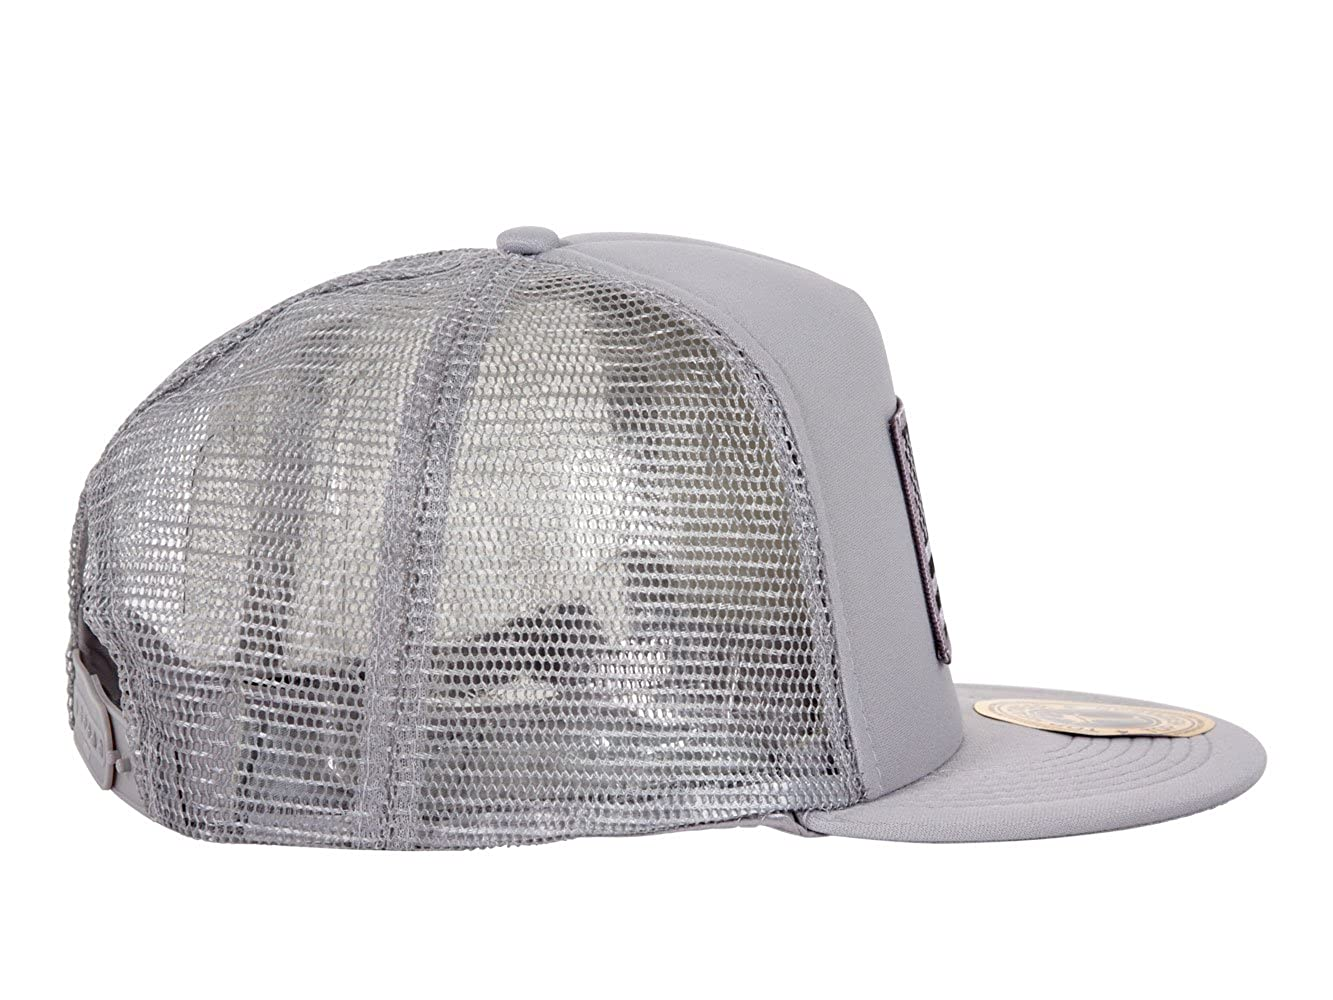 6c2ca917d0a TOP HEADWEAR USA Flag Flat Bill Trucker Mesh Hat - Grey at Amazon Men s  Clothing store